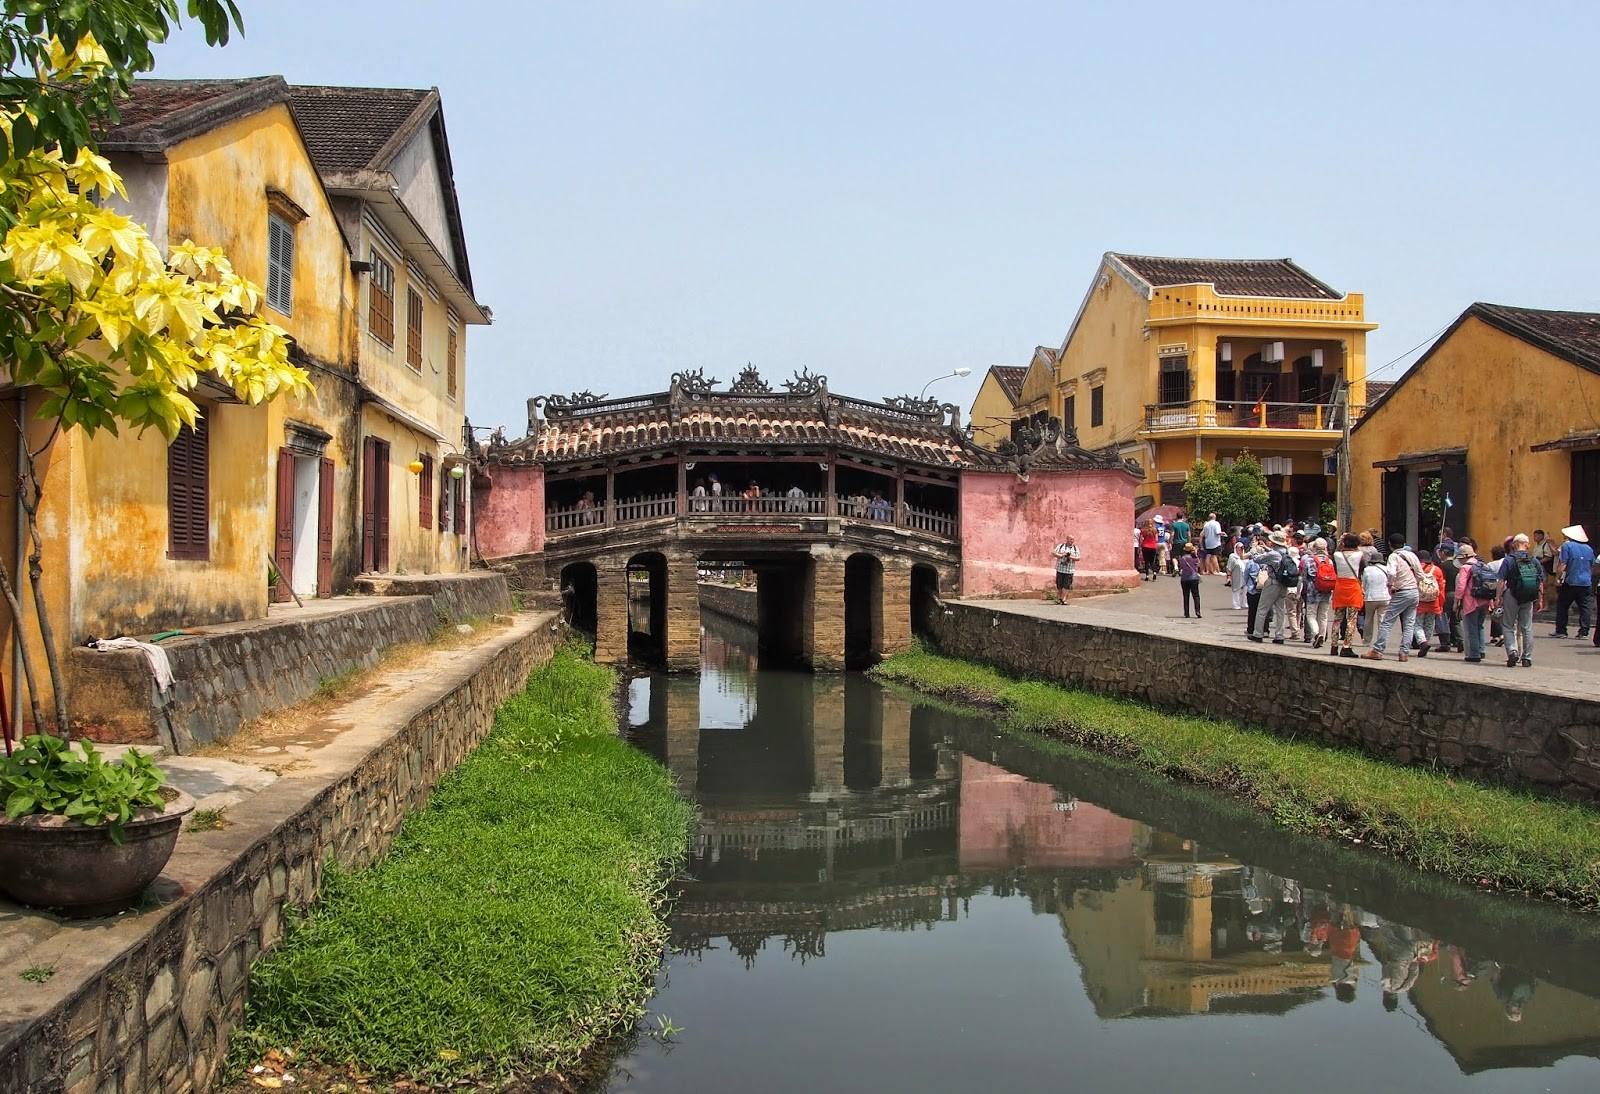 Japanese bridge in Hoi An city. Picture (intercontinentalgardener)